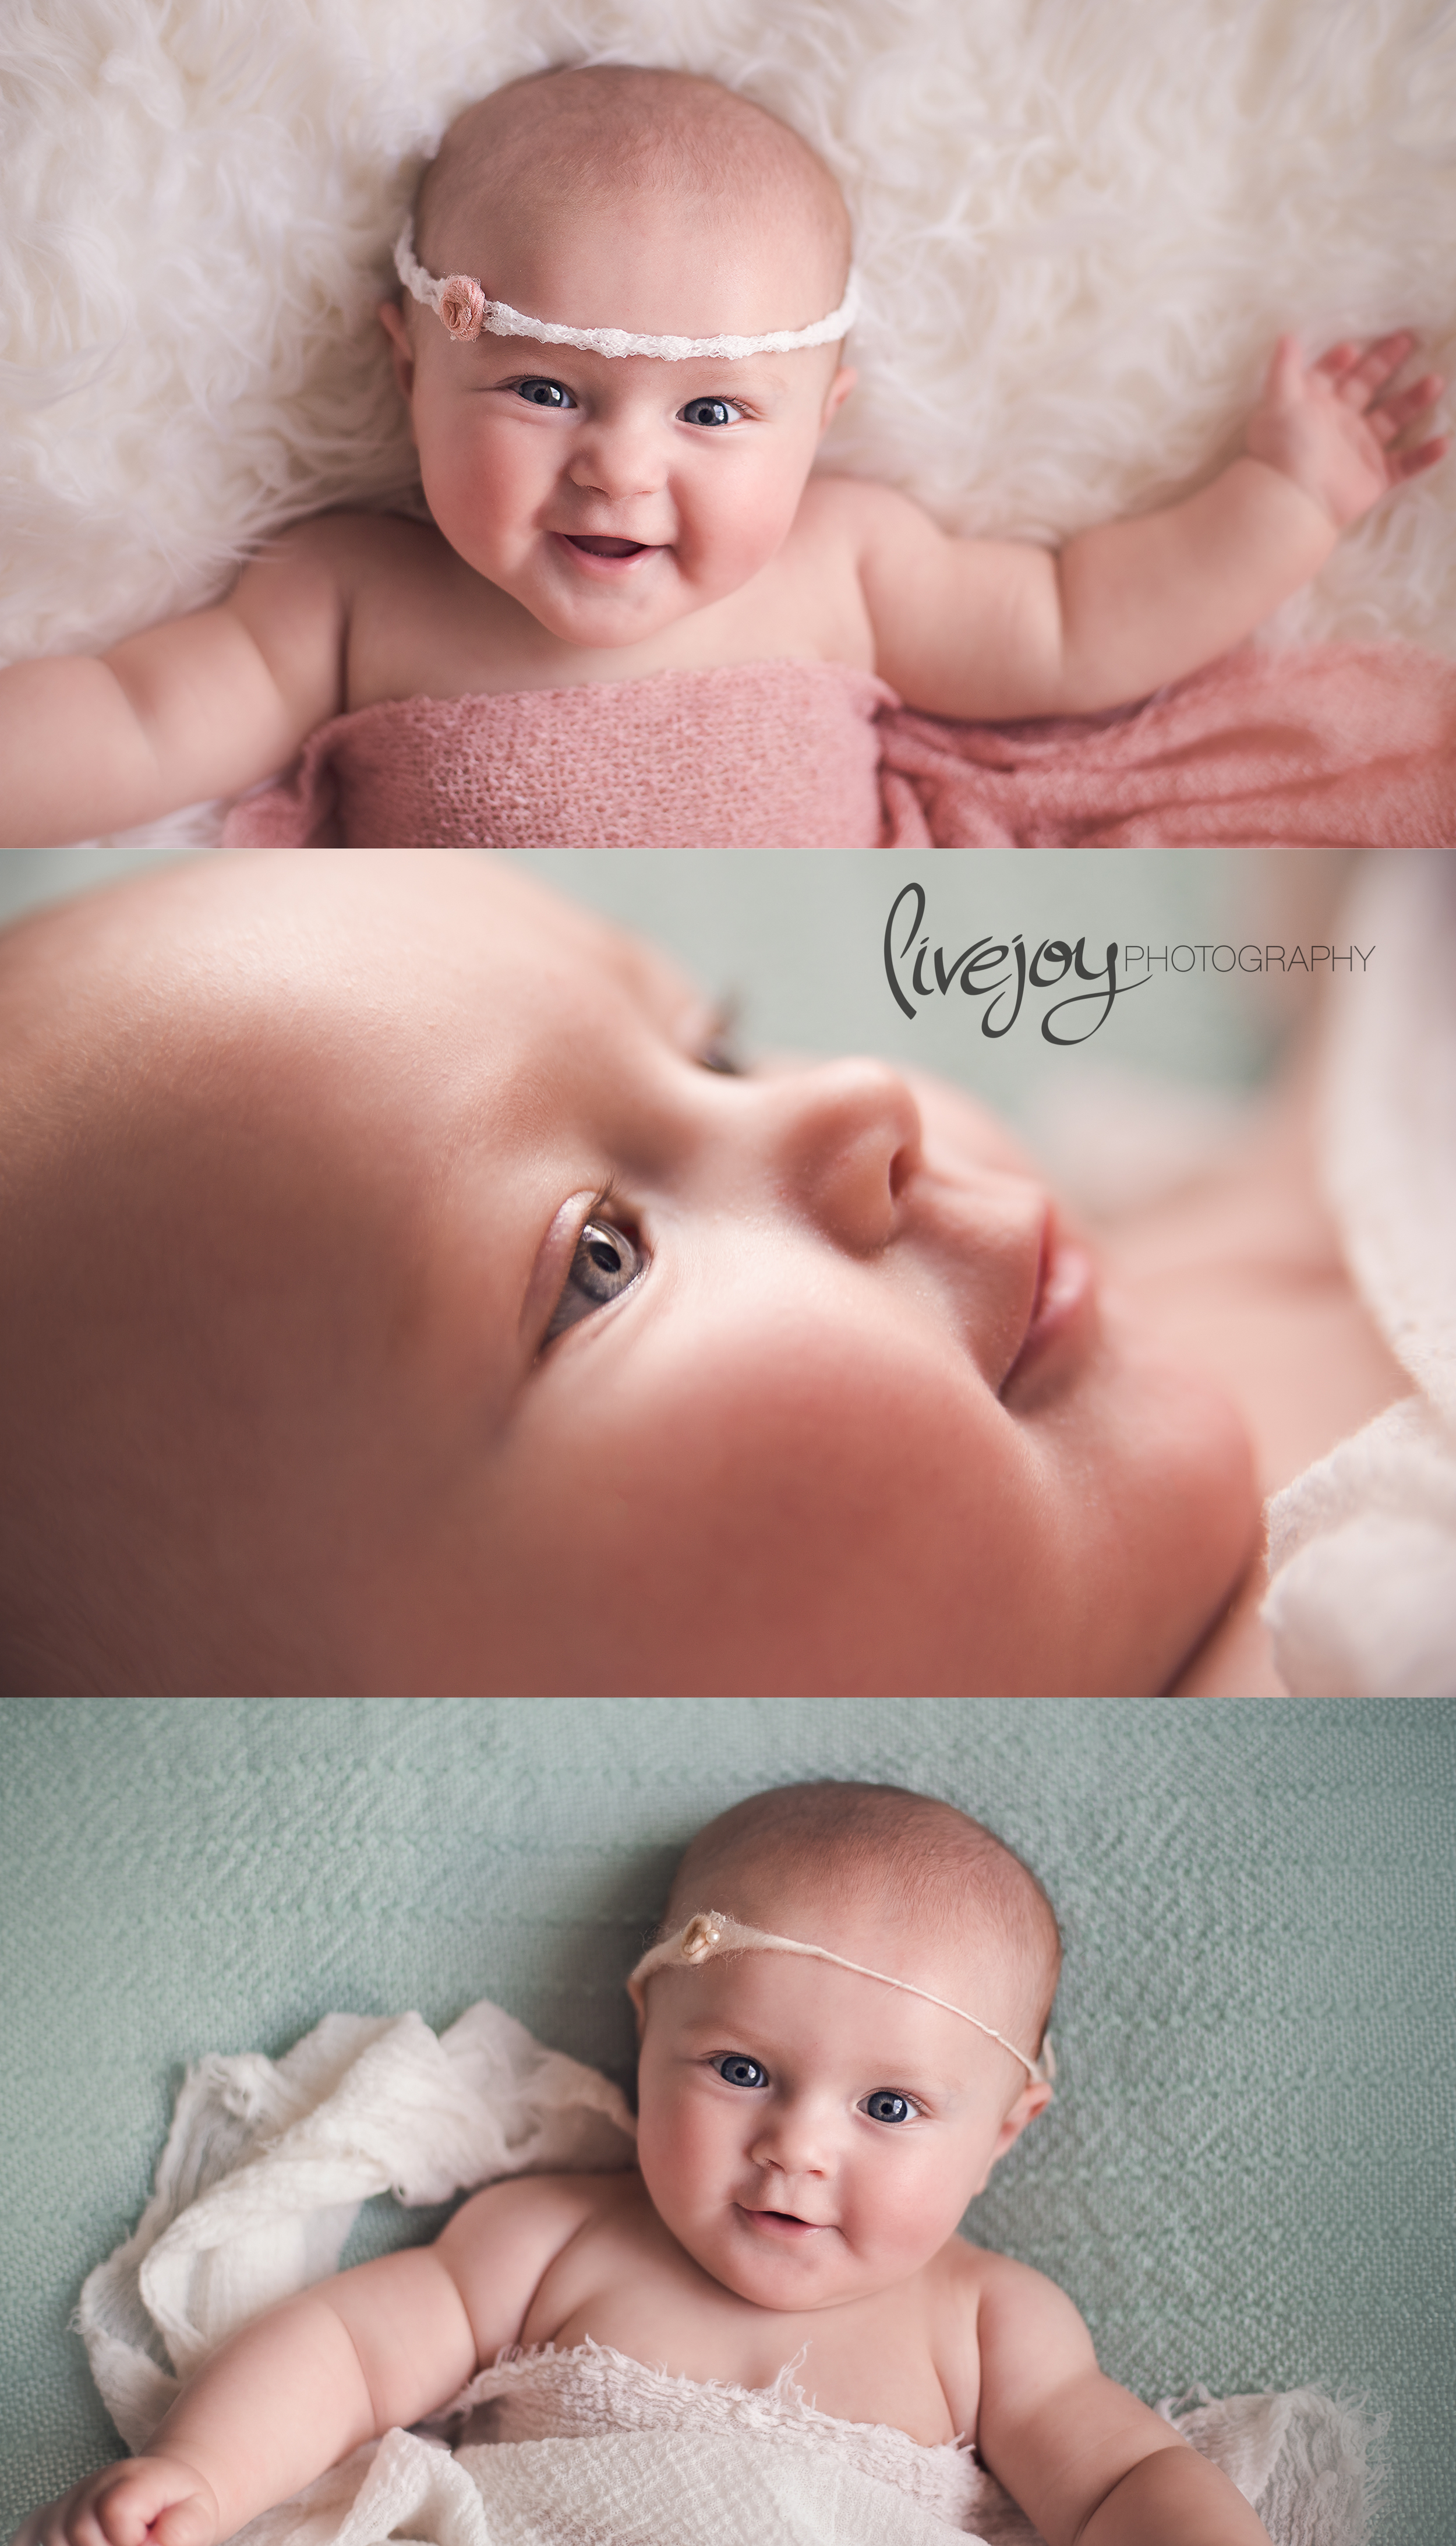 6 Month Photography | Oregon | LiveJoy Photography